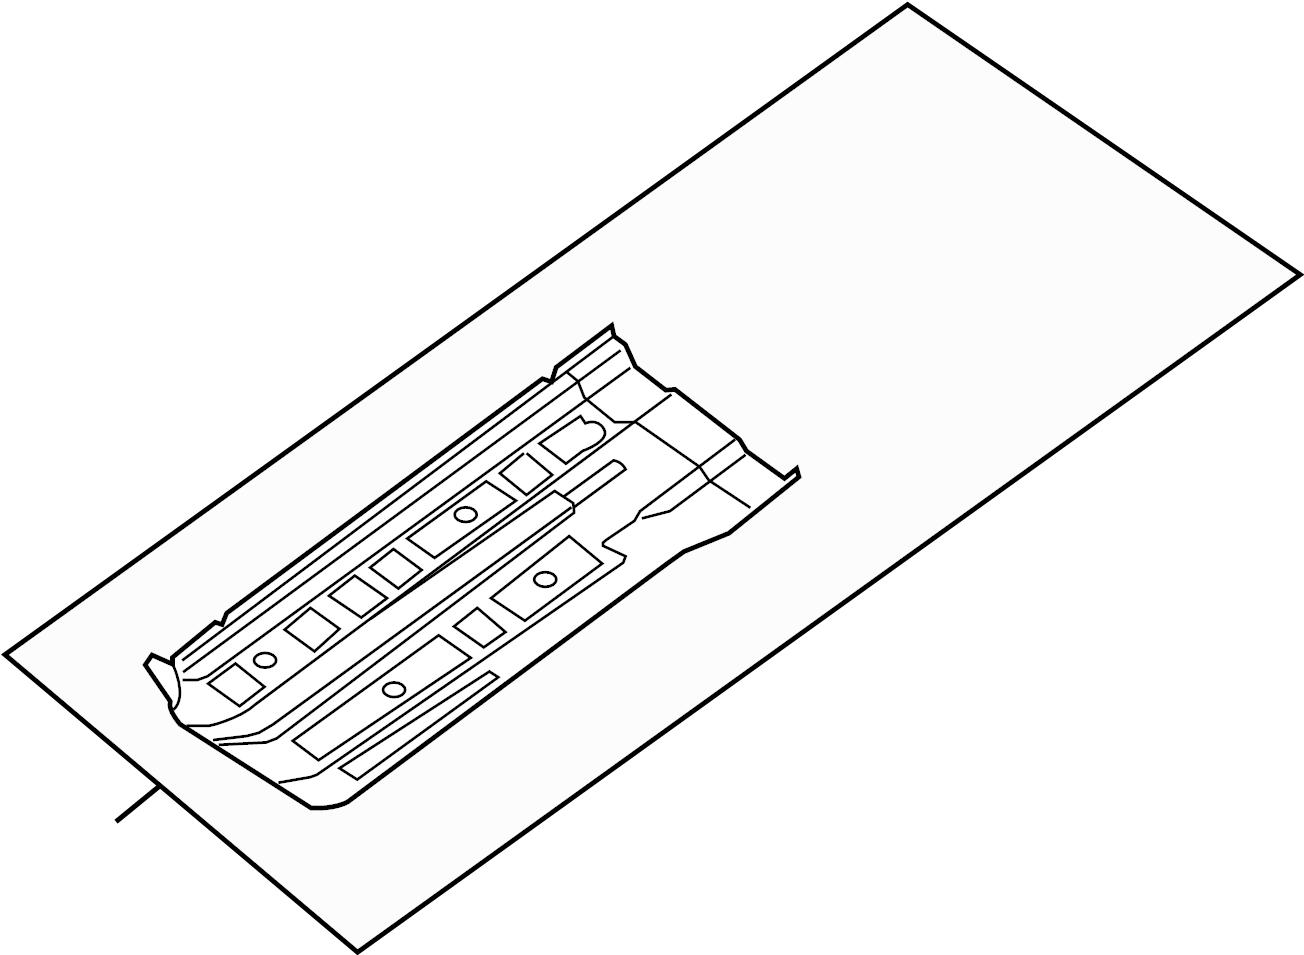 Nissan Maxima Floor Pan Right Front Panel